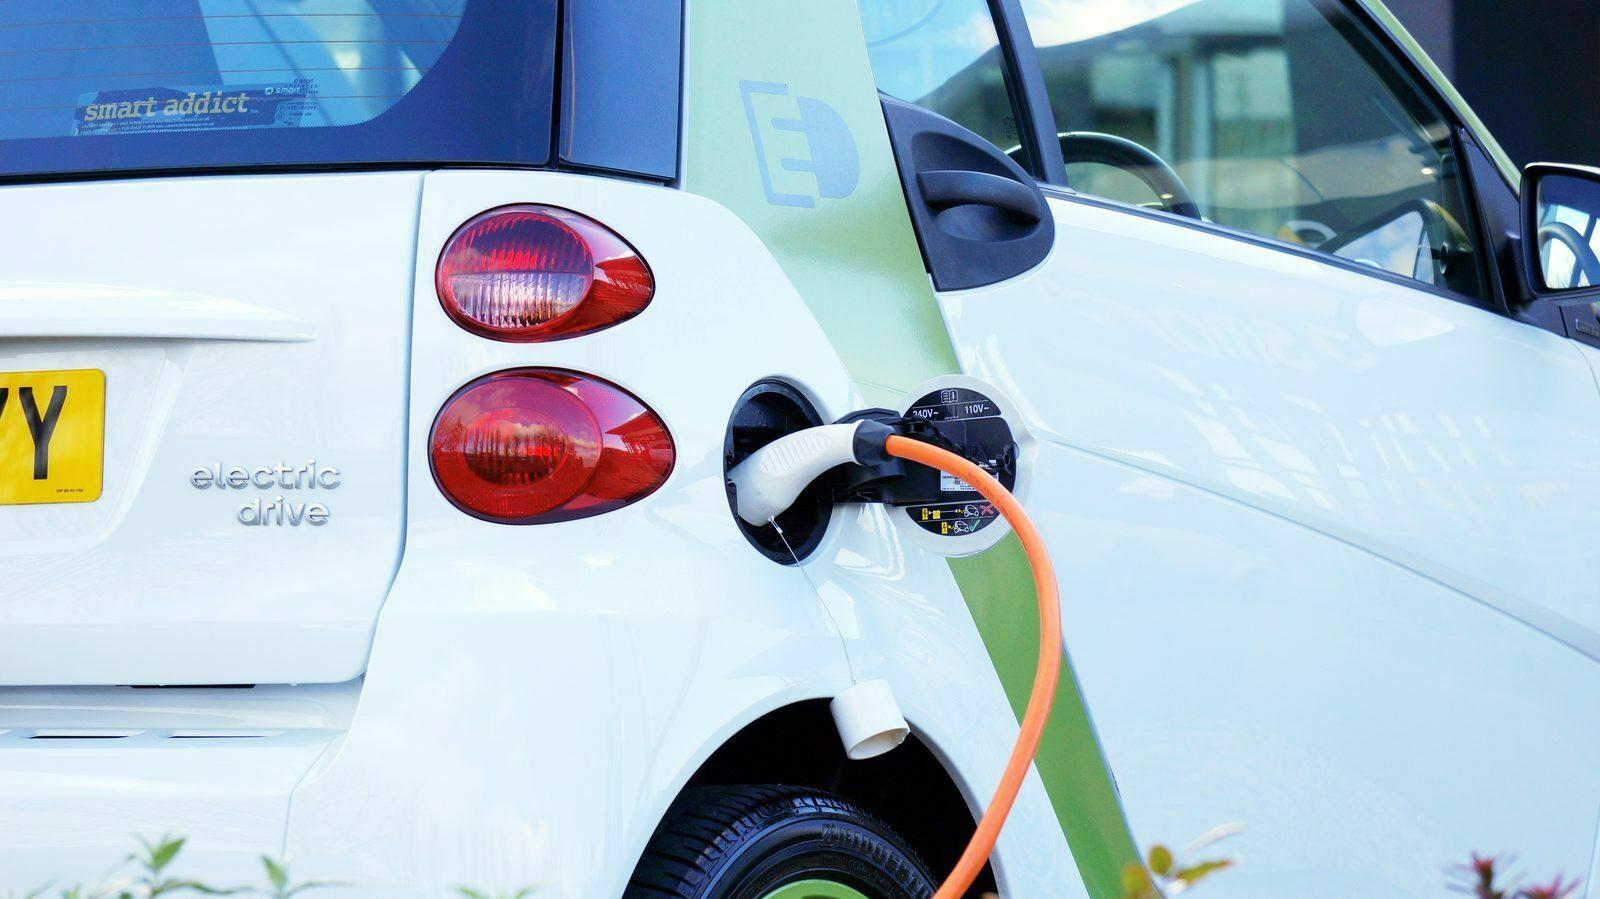 Oplaadpunt elektrische auto (incl. snellader)